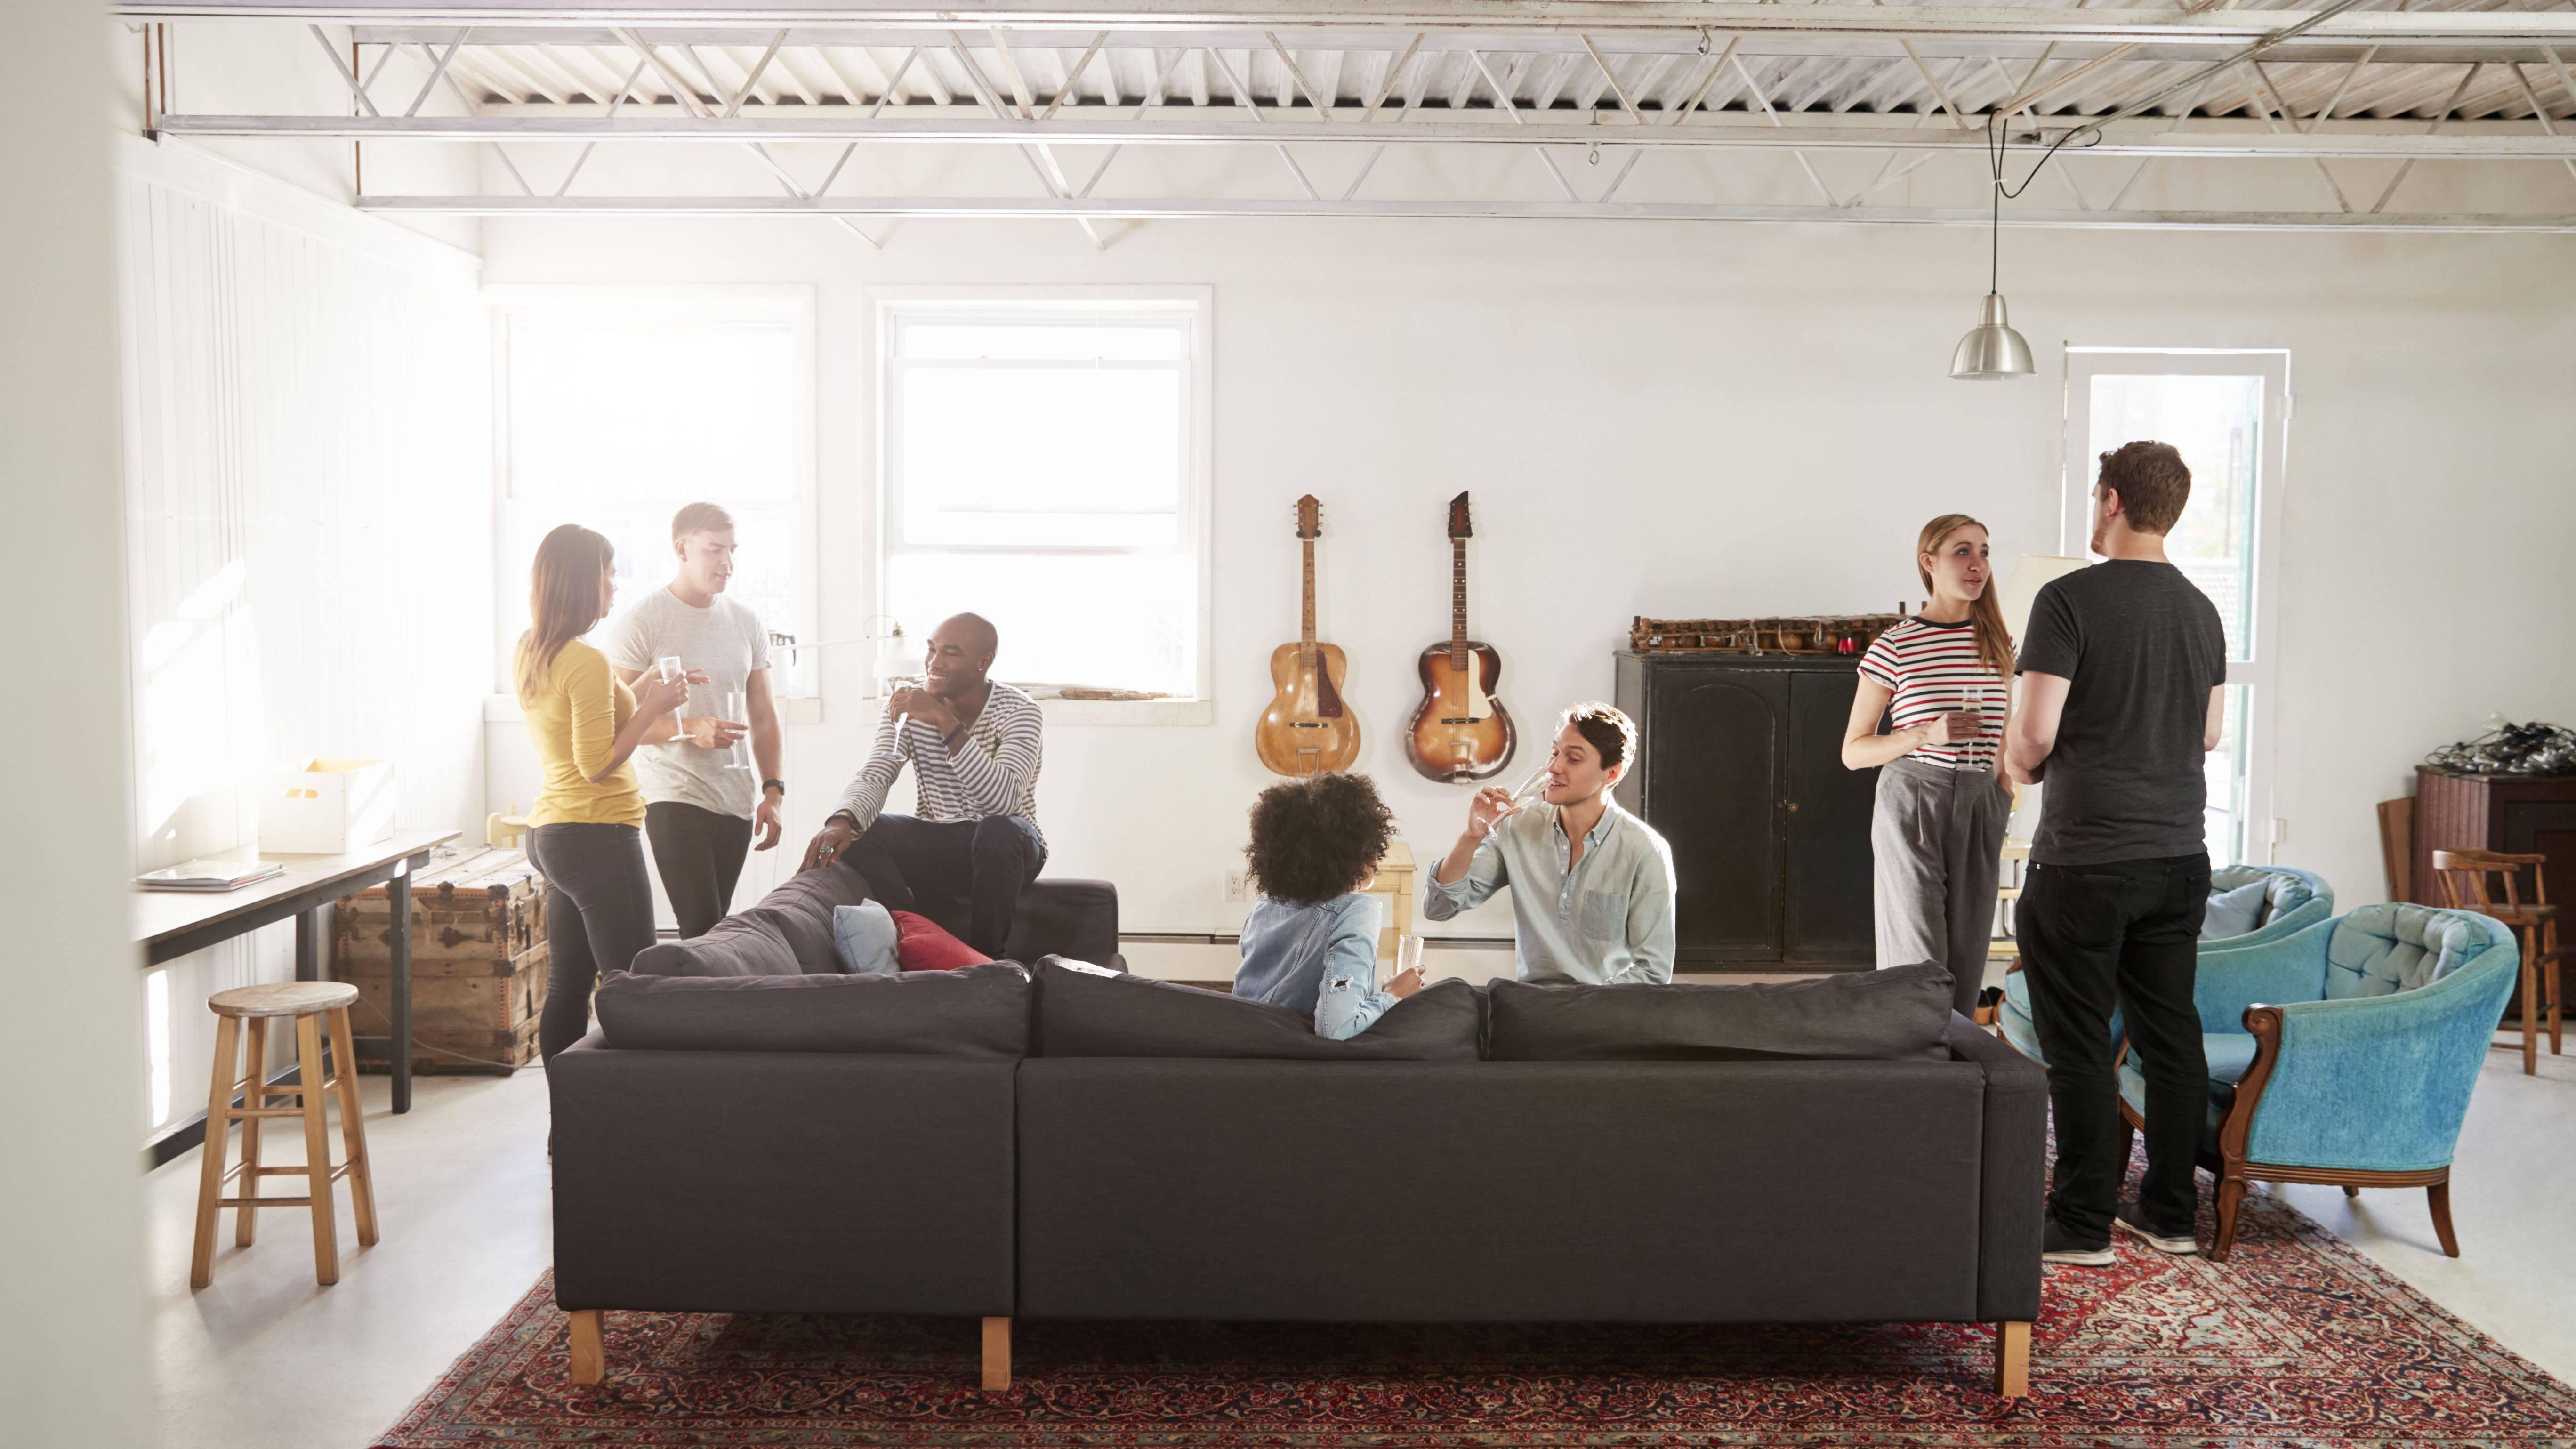 friends at a party in a new york loft apartment full length ccdf44a4c14e4873a5a2b5df46b82ca4